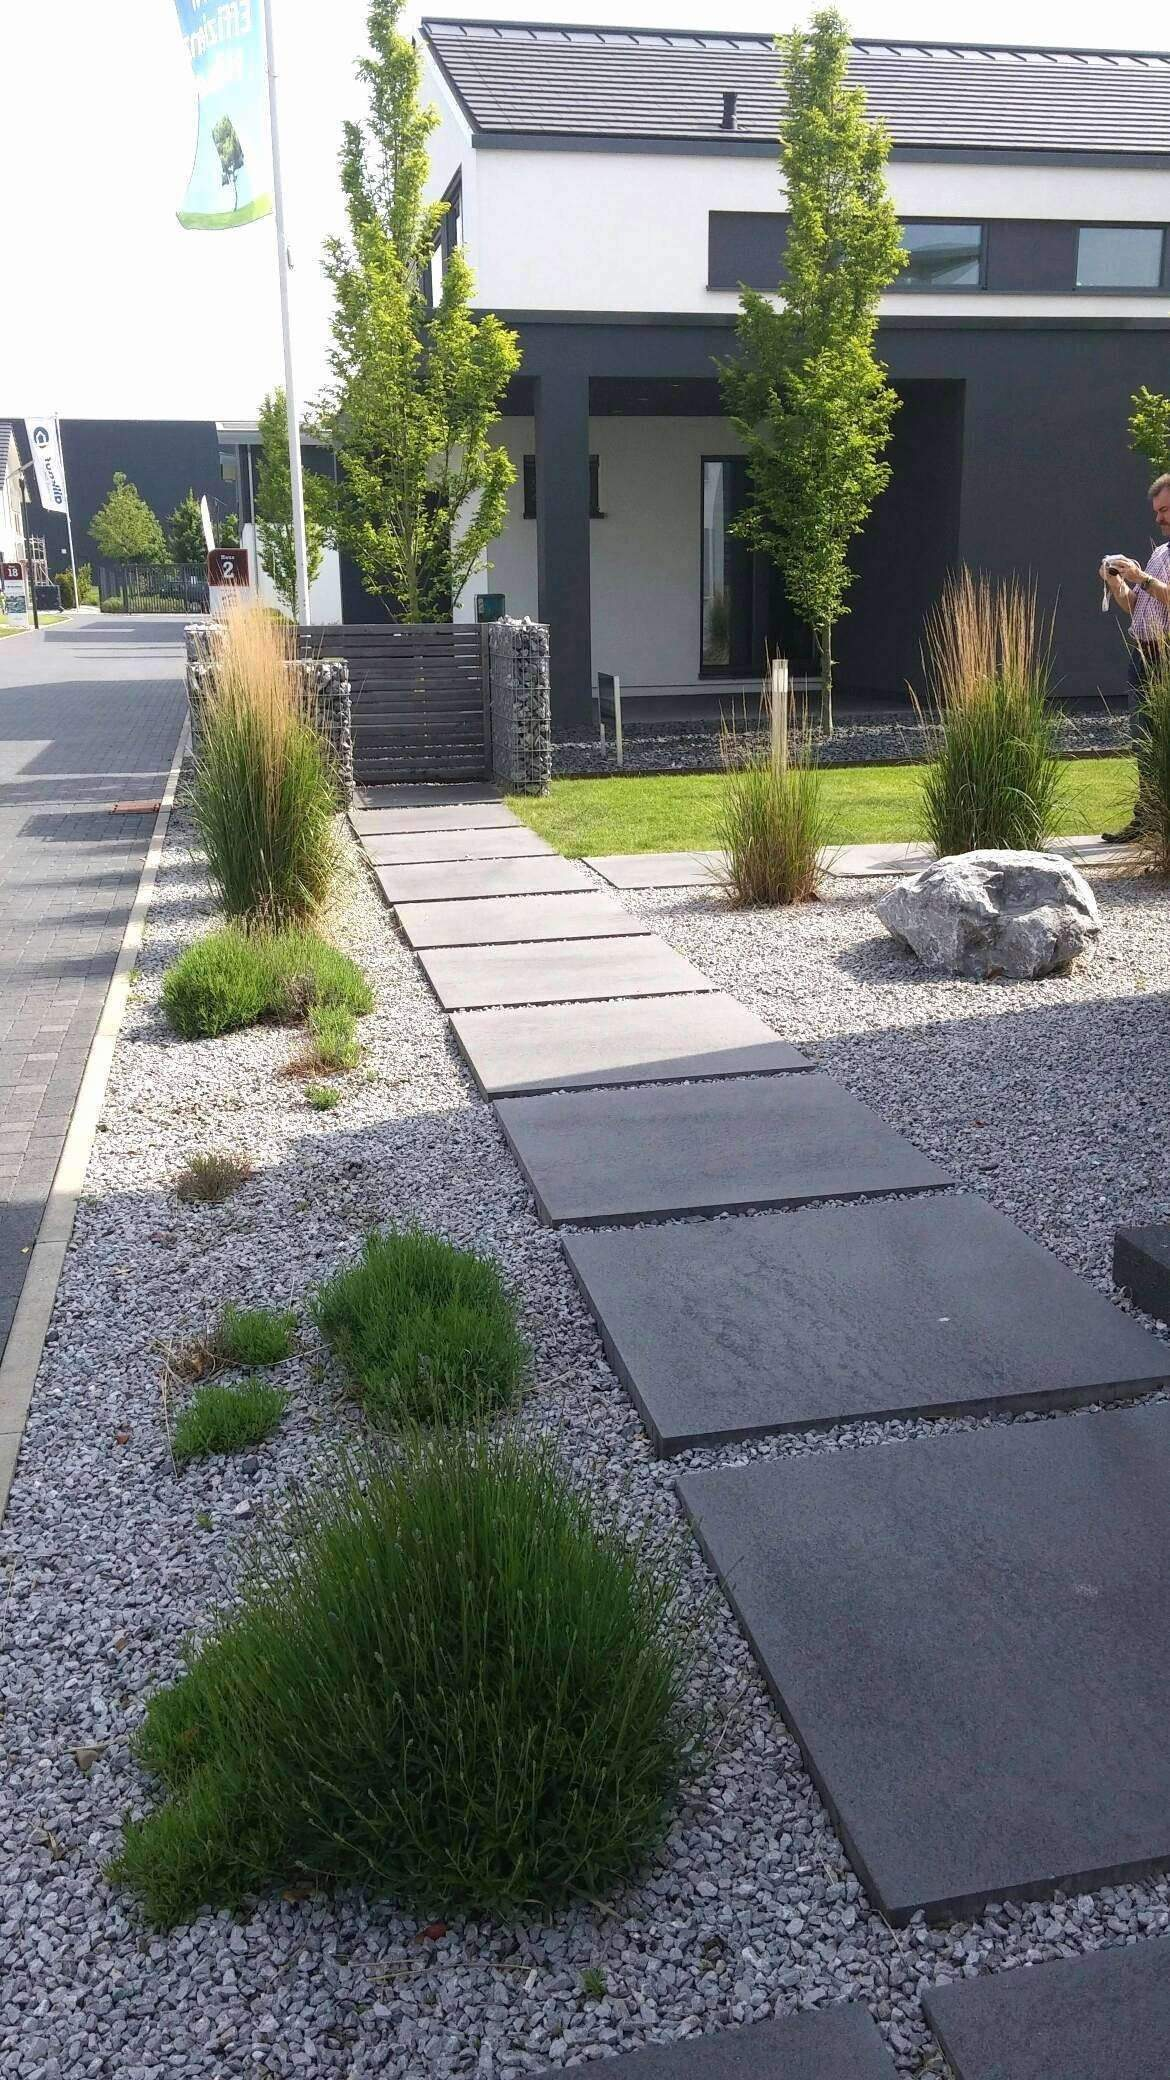 Haushalt Und Garten Einzigartig Garten Ideas Garten Anlegen Lovely Aussenleuchten Garten 0d